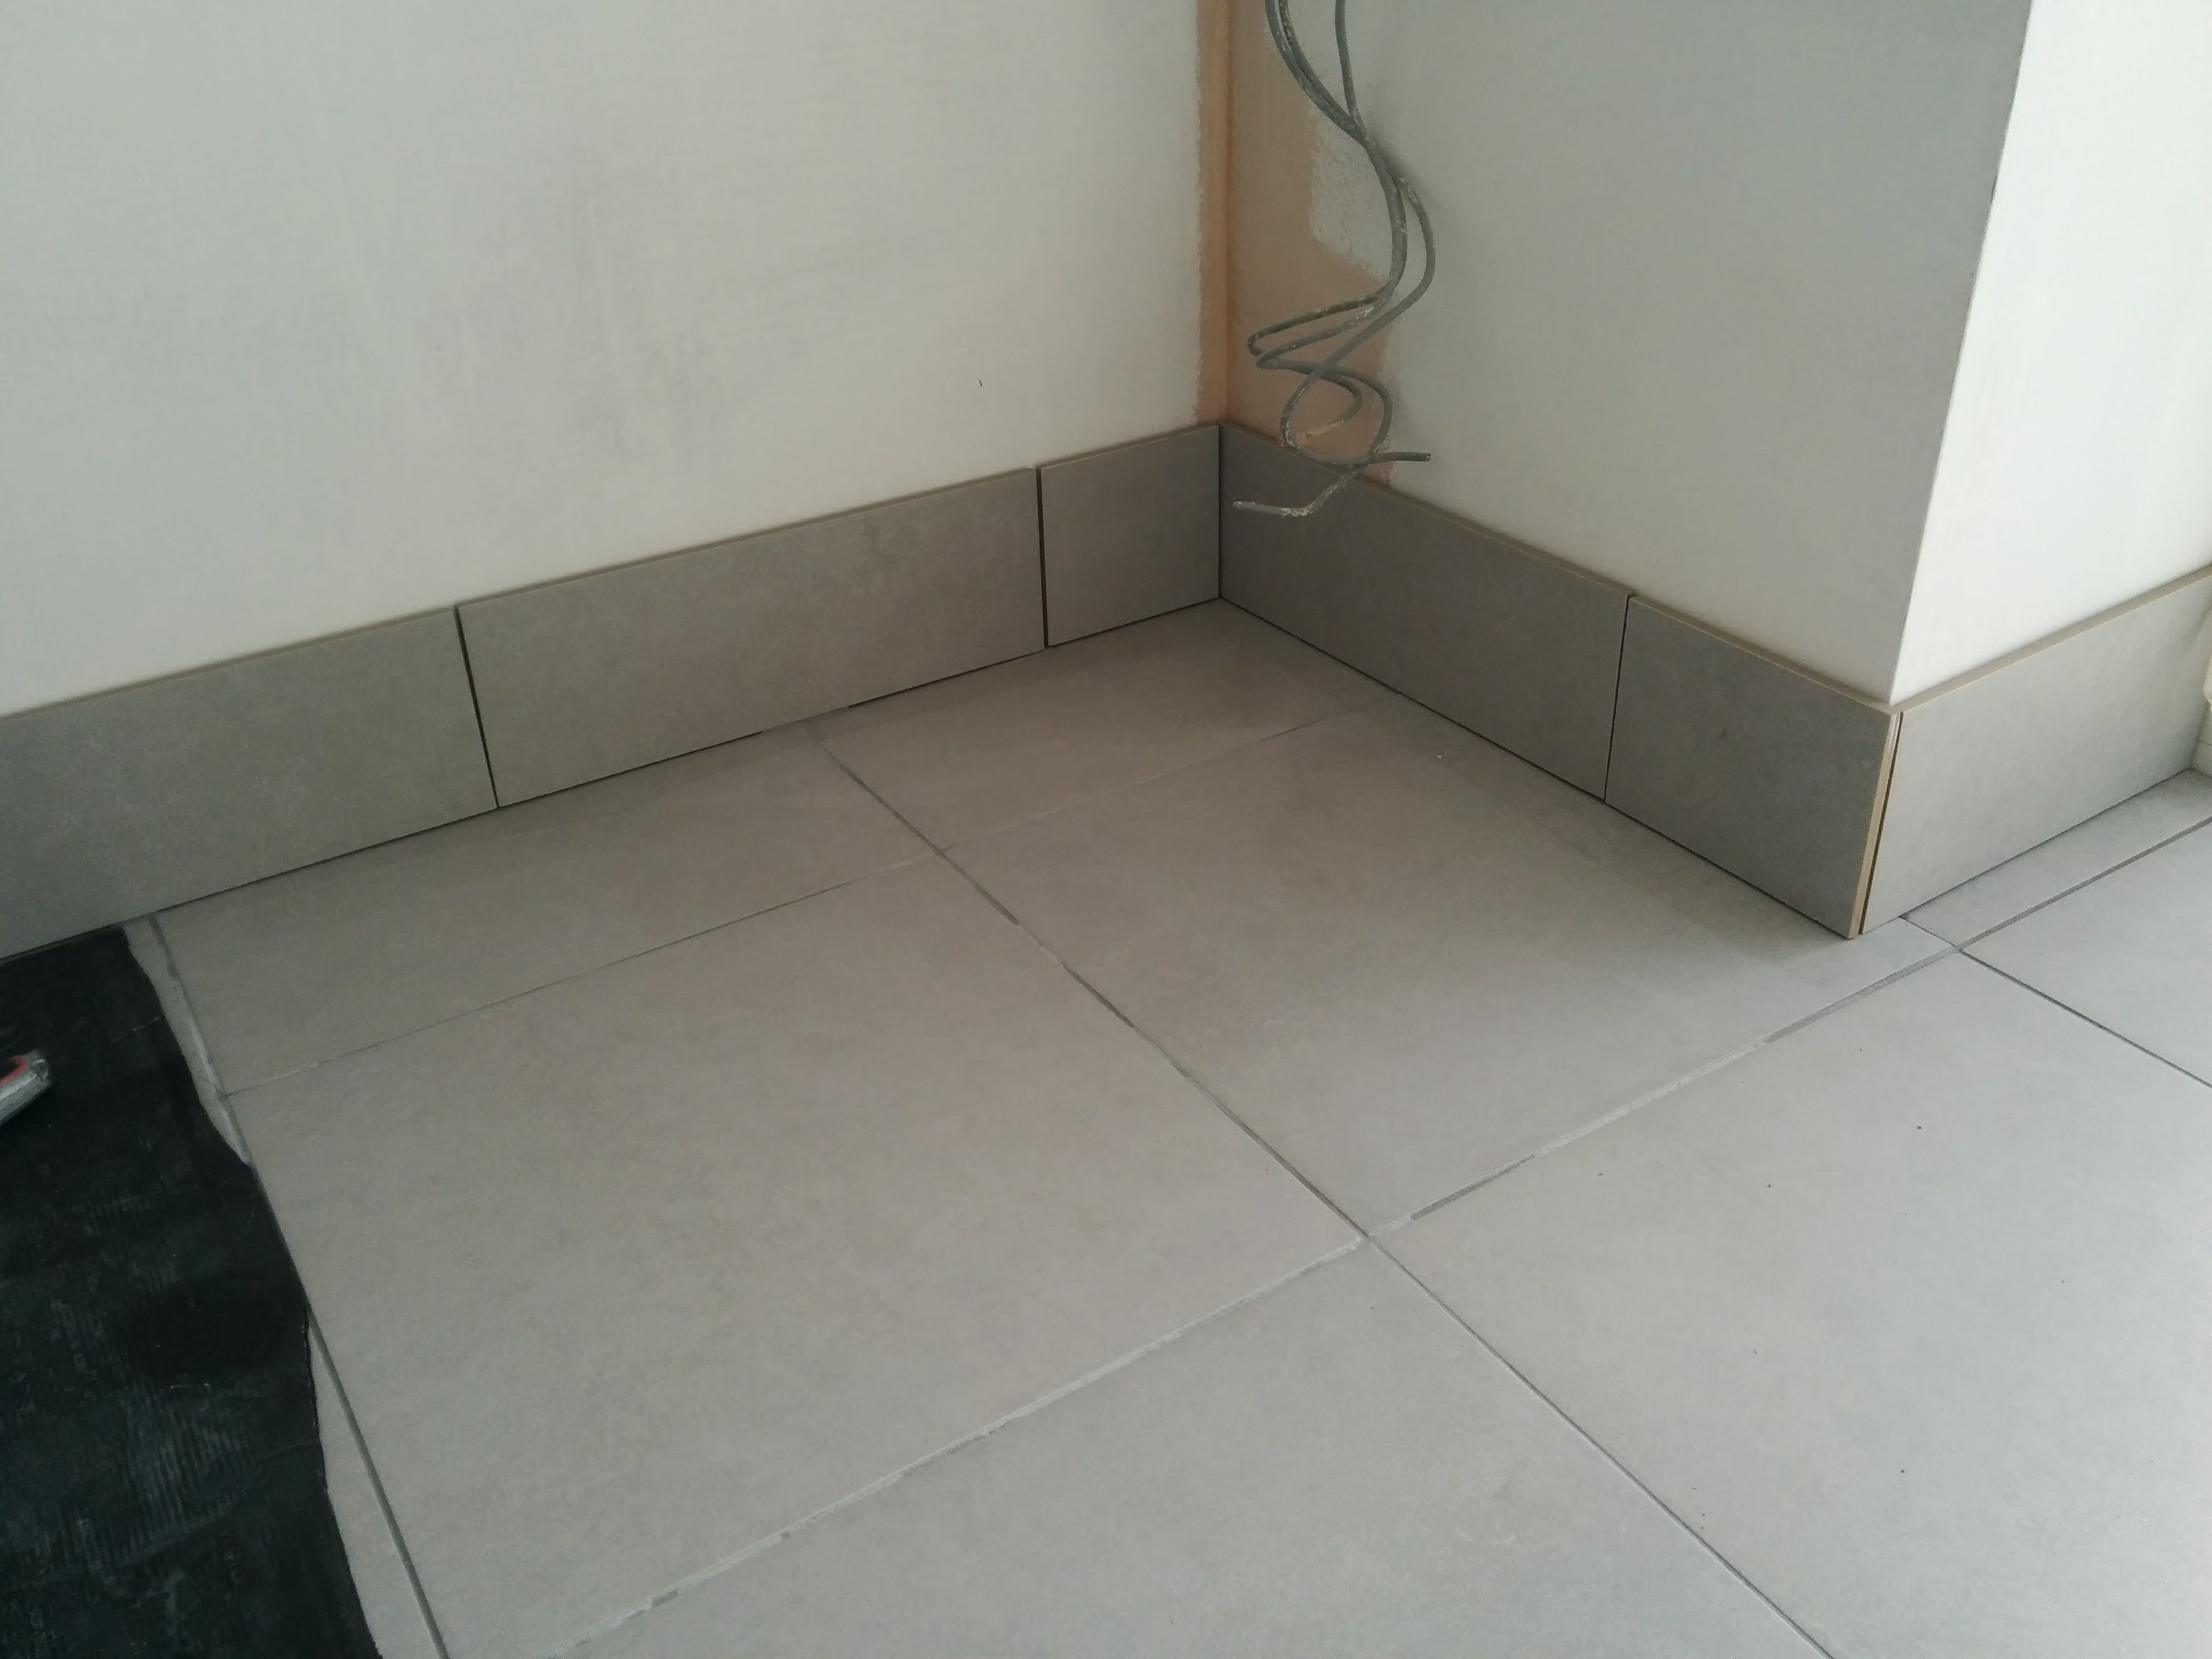 Assessing the quality of a laid tile floor floor tiles tiling img20170305115652umbg5ea400b94cfbaf180ff52e92747ba078g dailygadgetfo Images